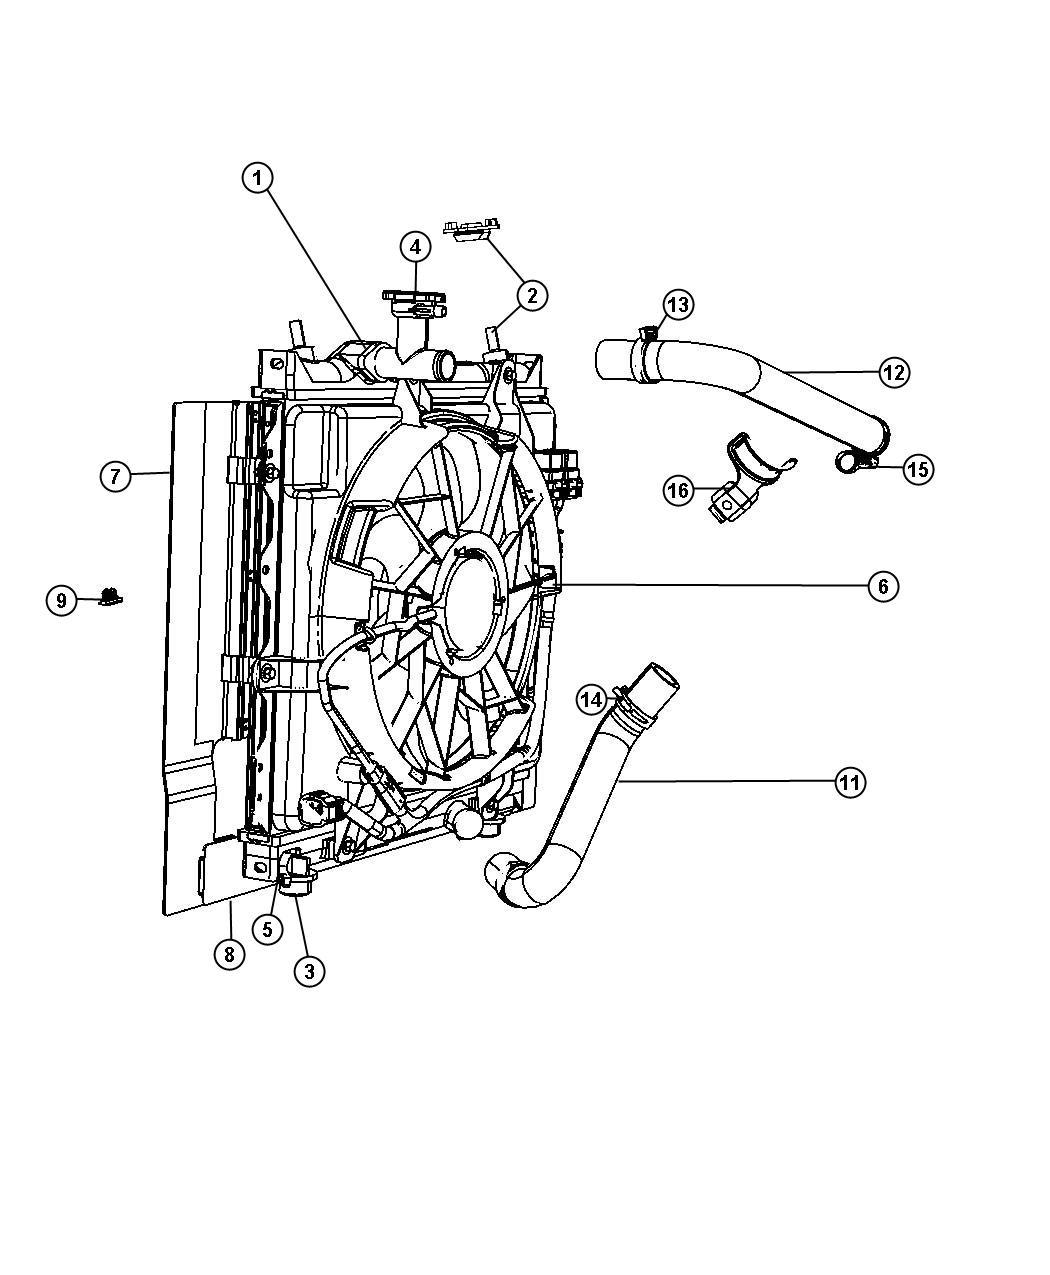 2008 Chrysler Pt Cruiser Fan Module  Radiator Cooling  Fan